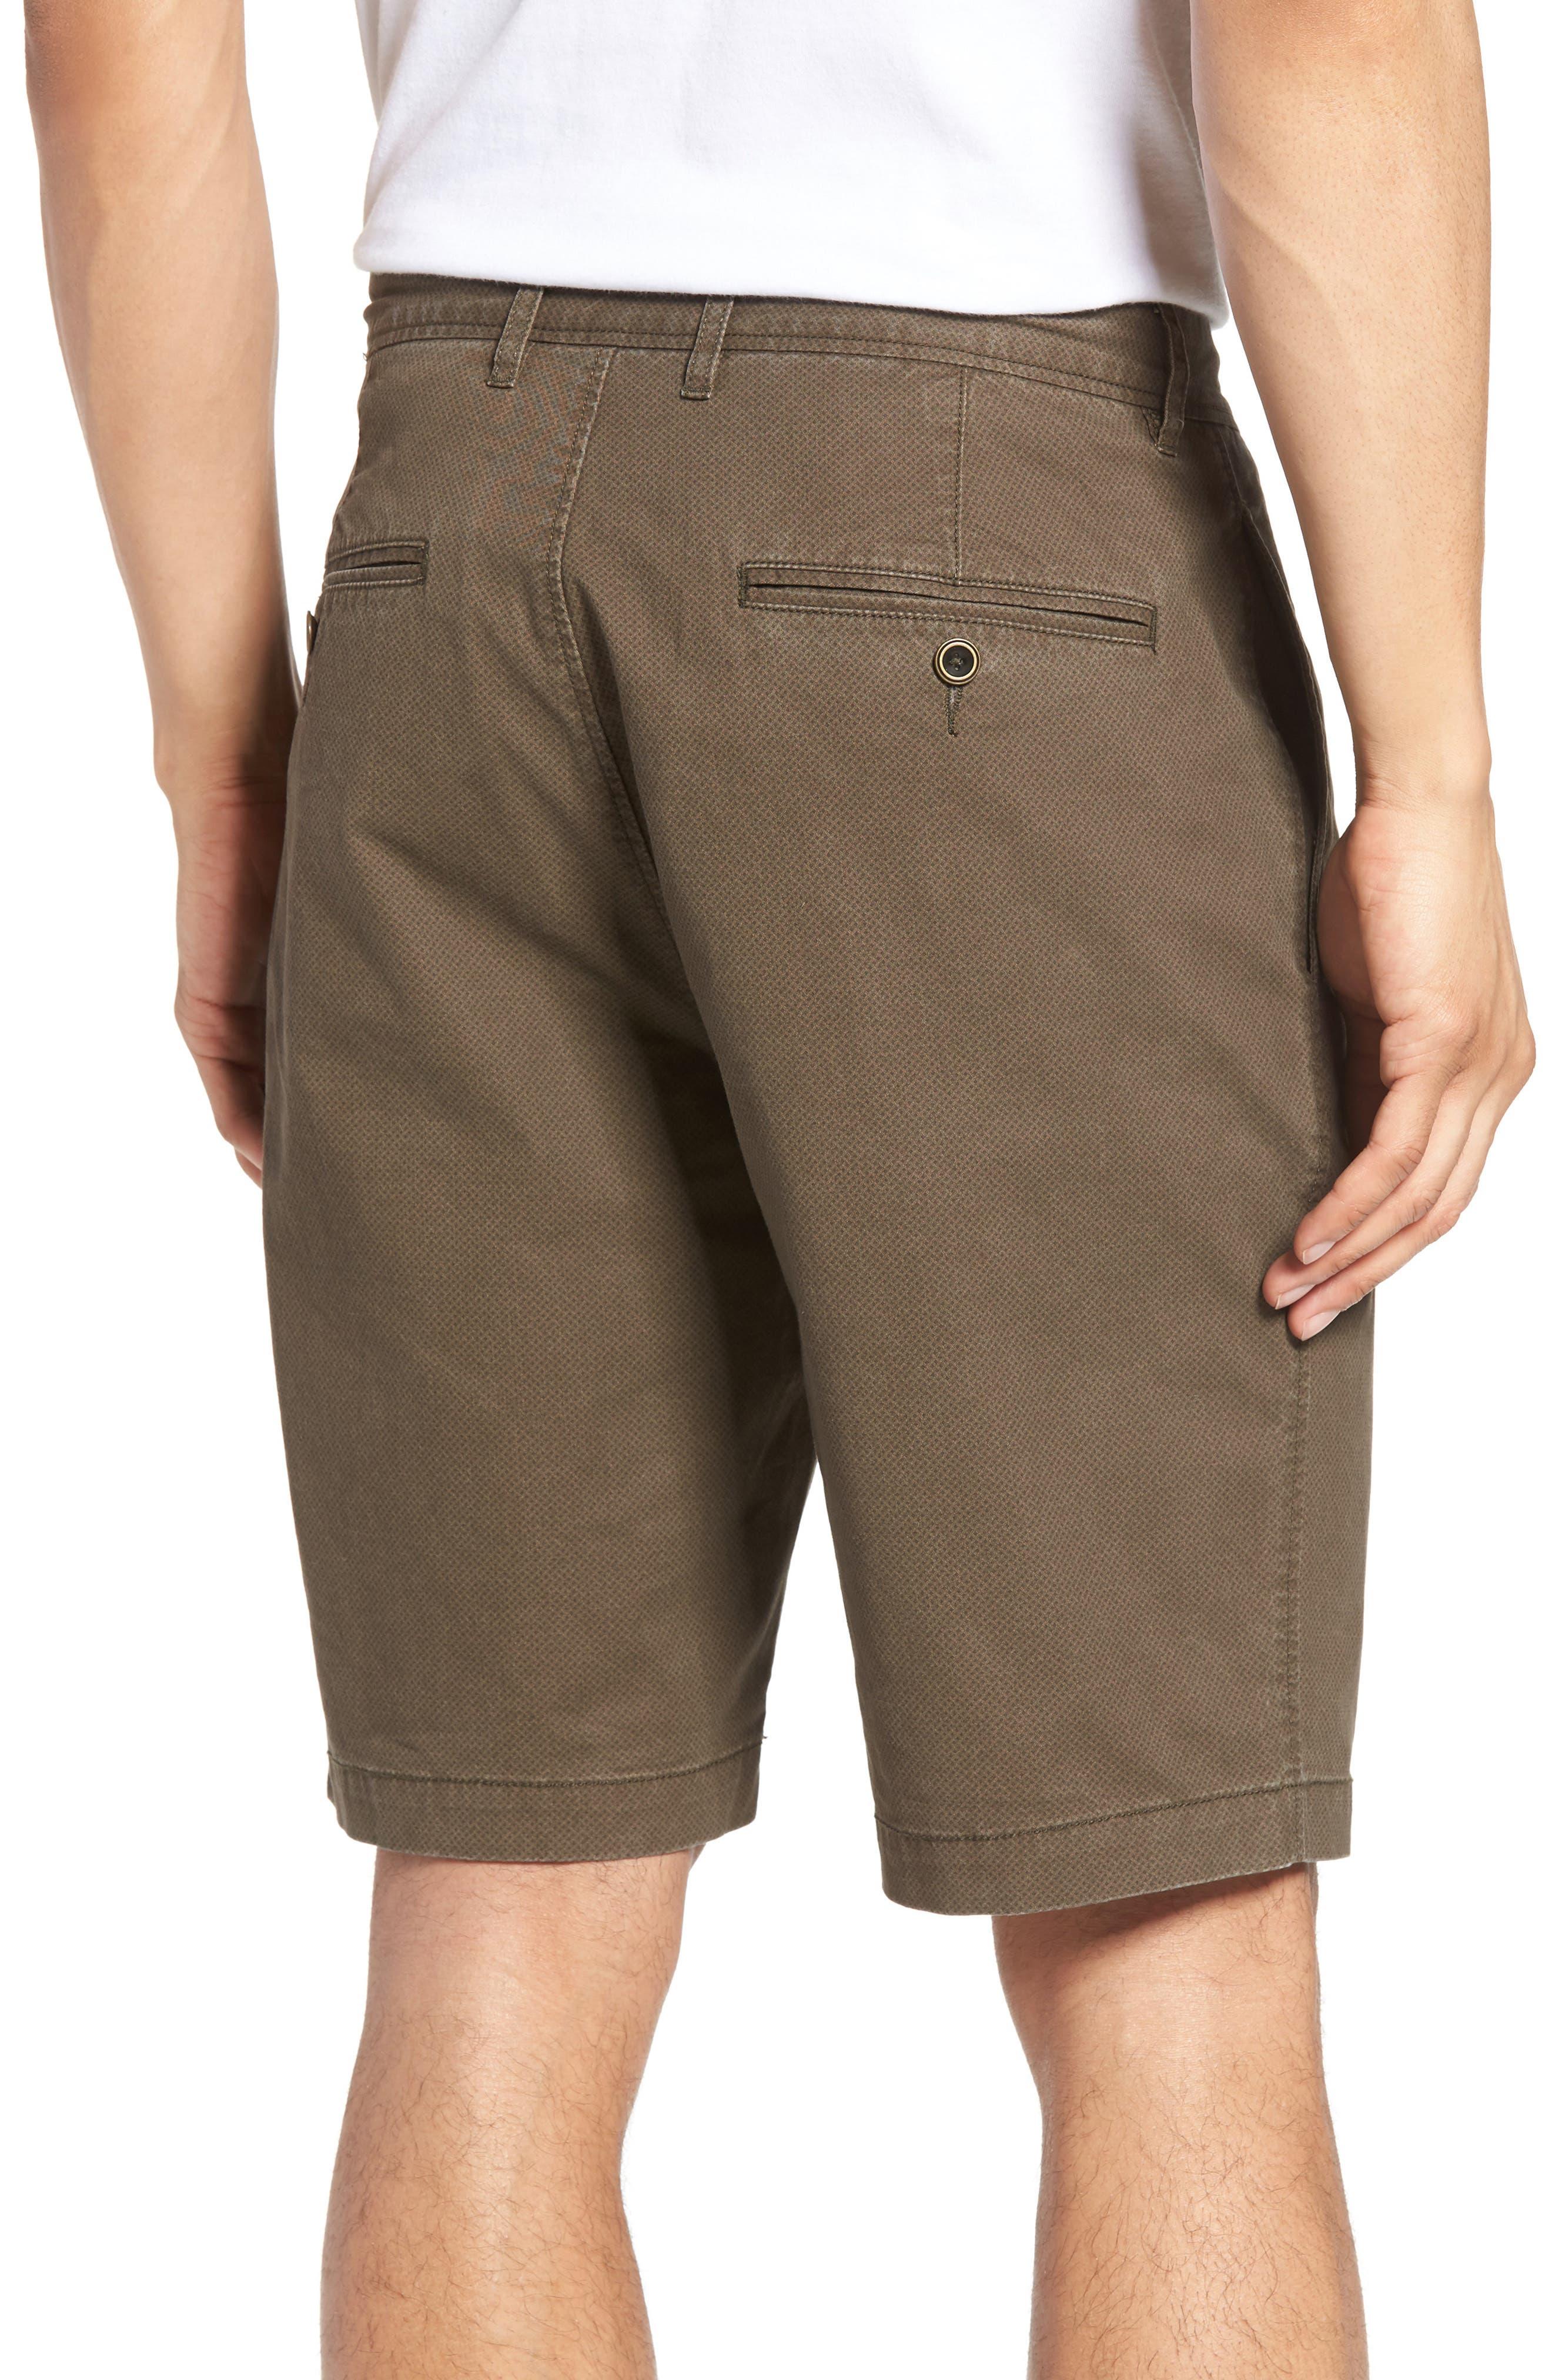 Benneydale Shorts,                             Alternate thumbnail 2, color,                             Olive